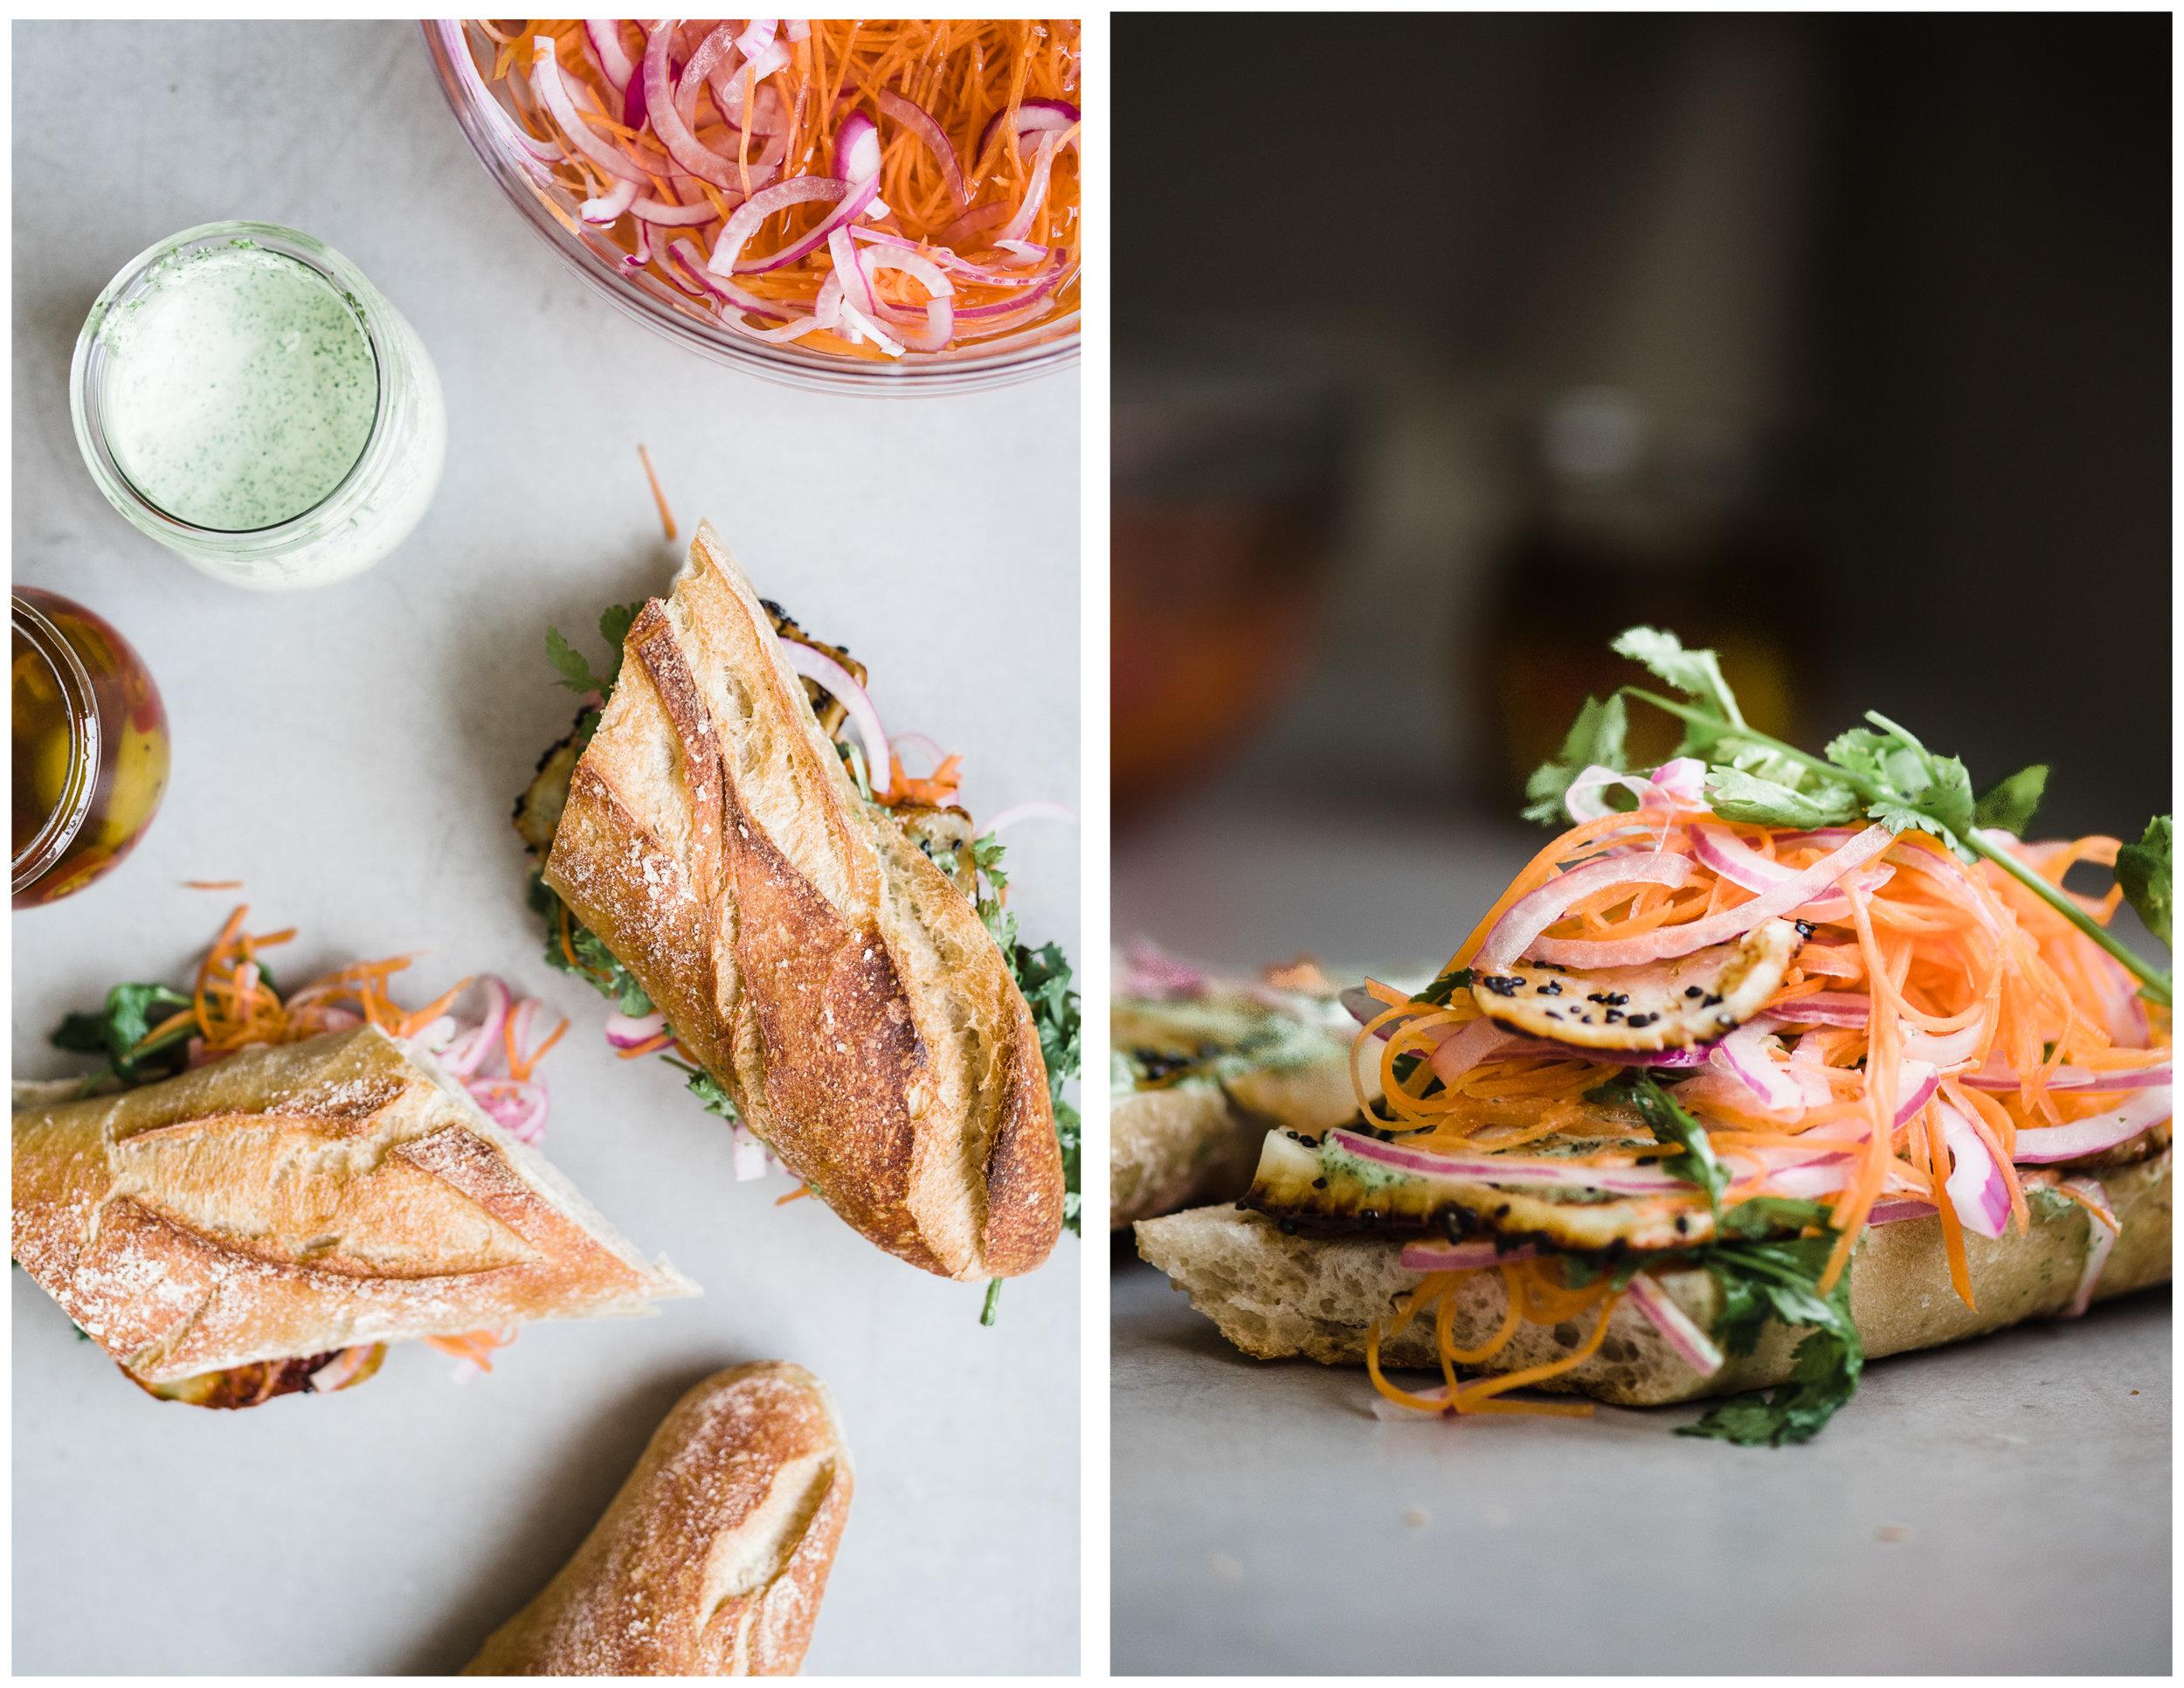 Halloumi Banh Mi Sandwich